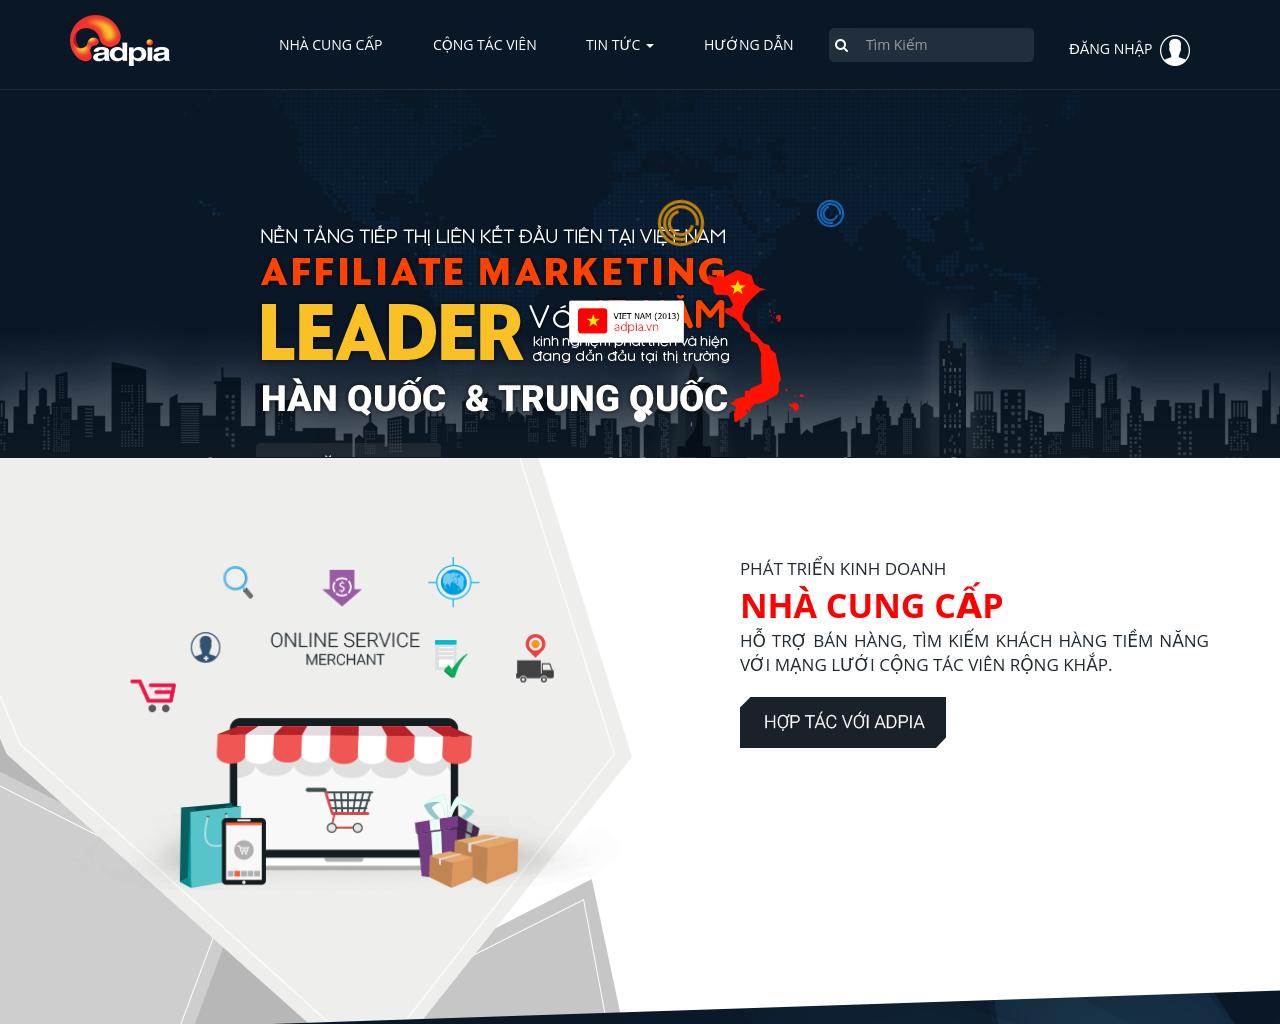 adpia-Advertising-Reviews-Pricing